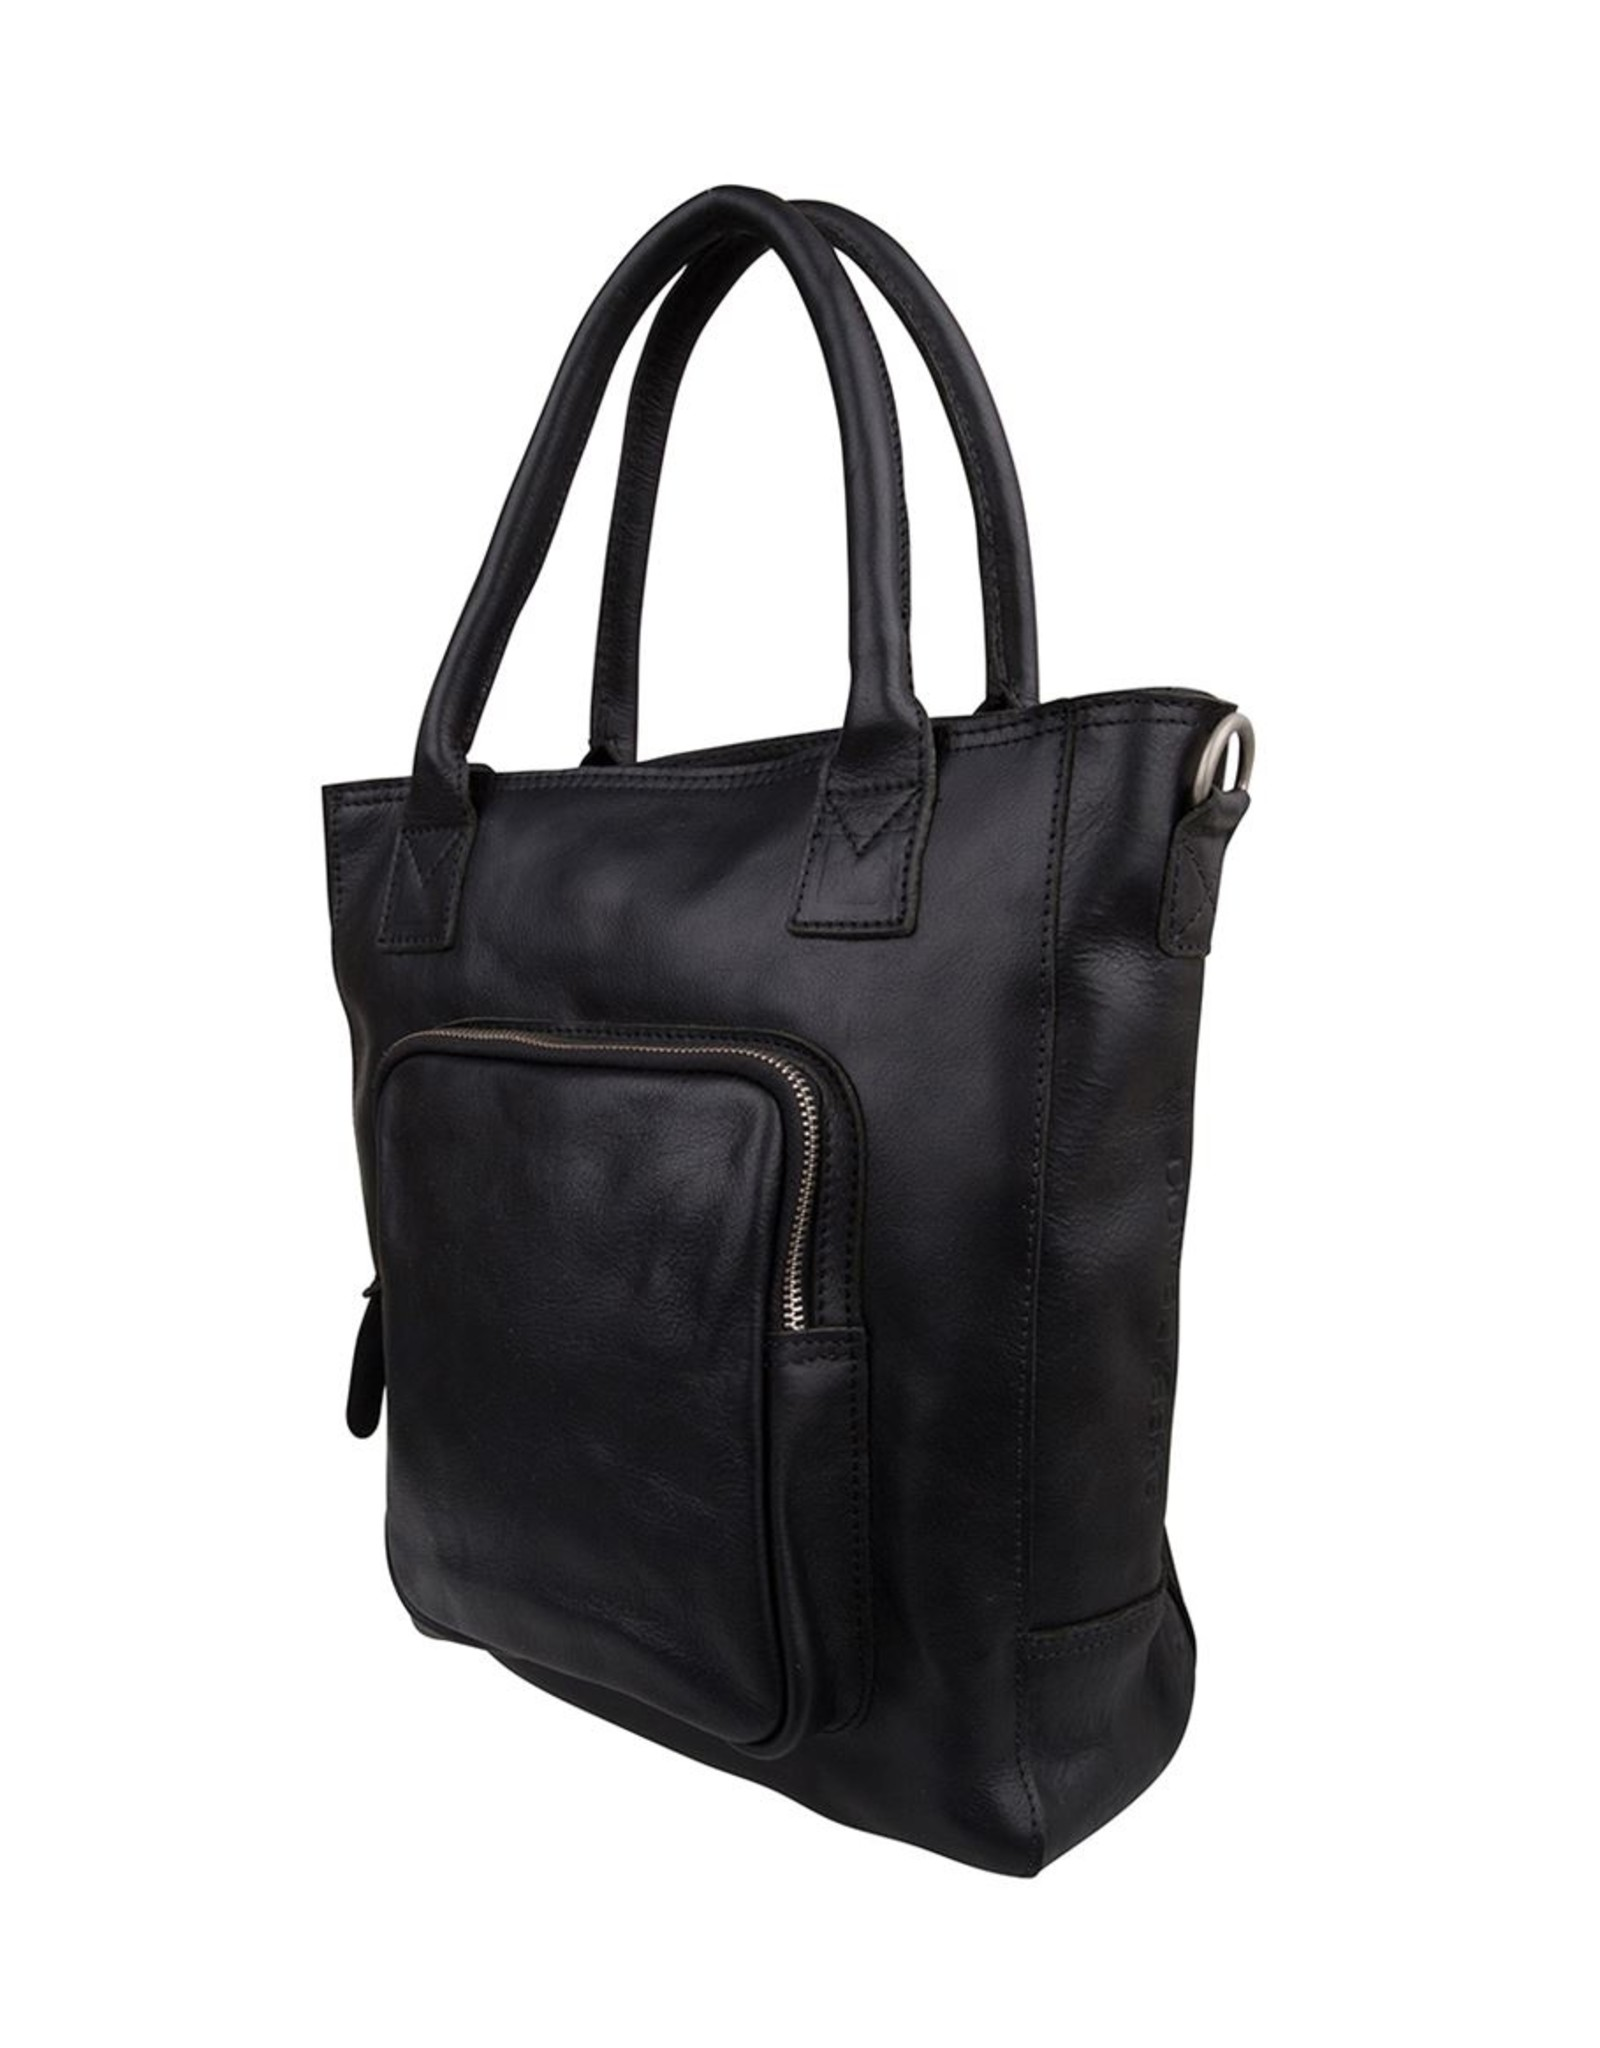 Cowboysbag Leren tassen - Cowboysbag MellorZwart